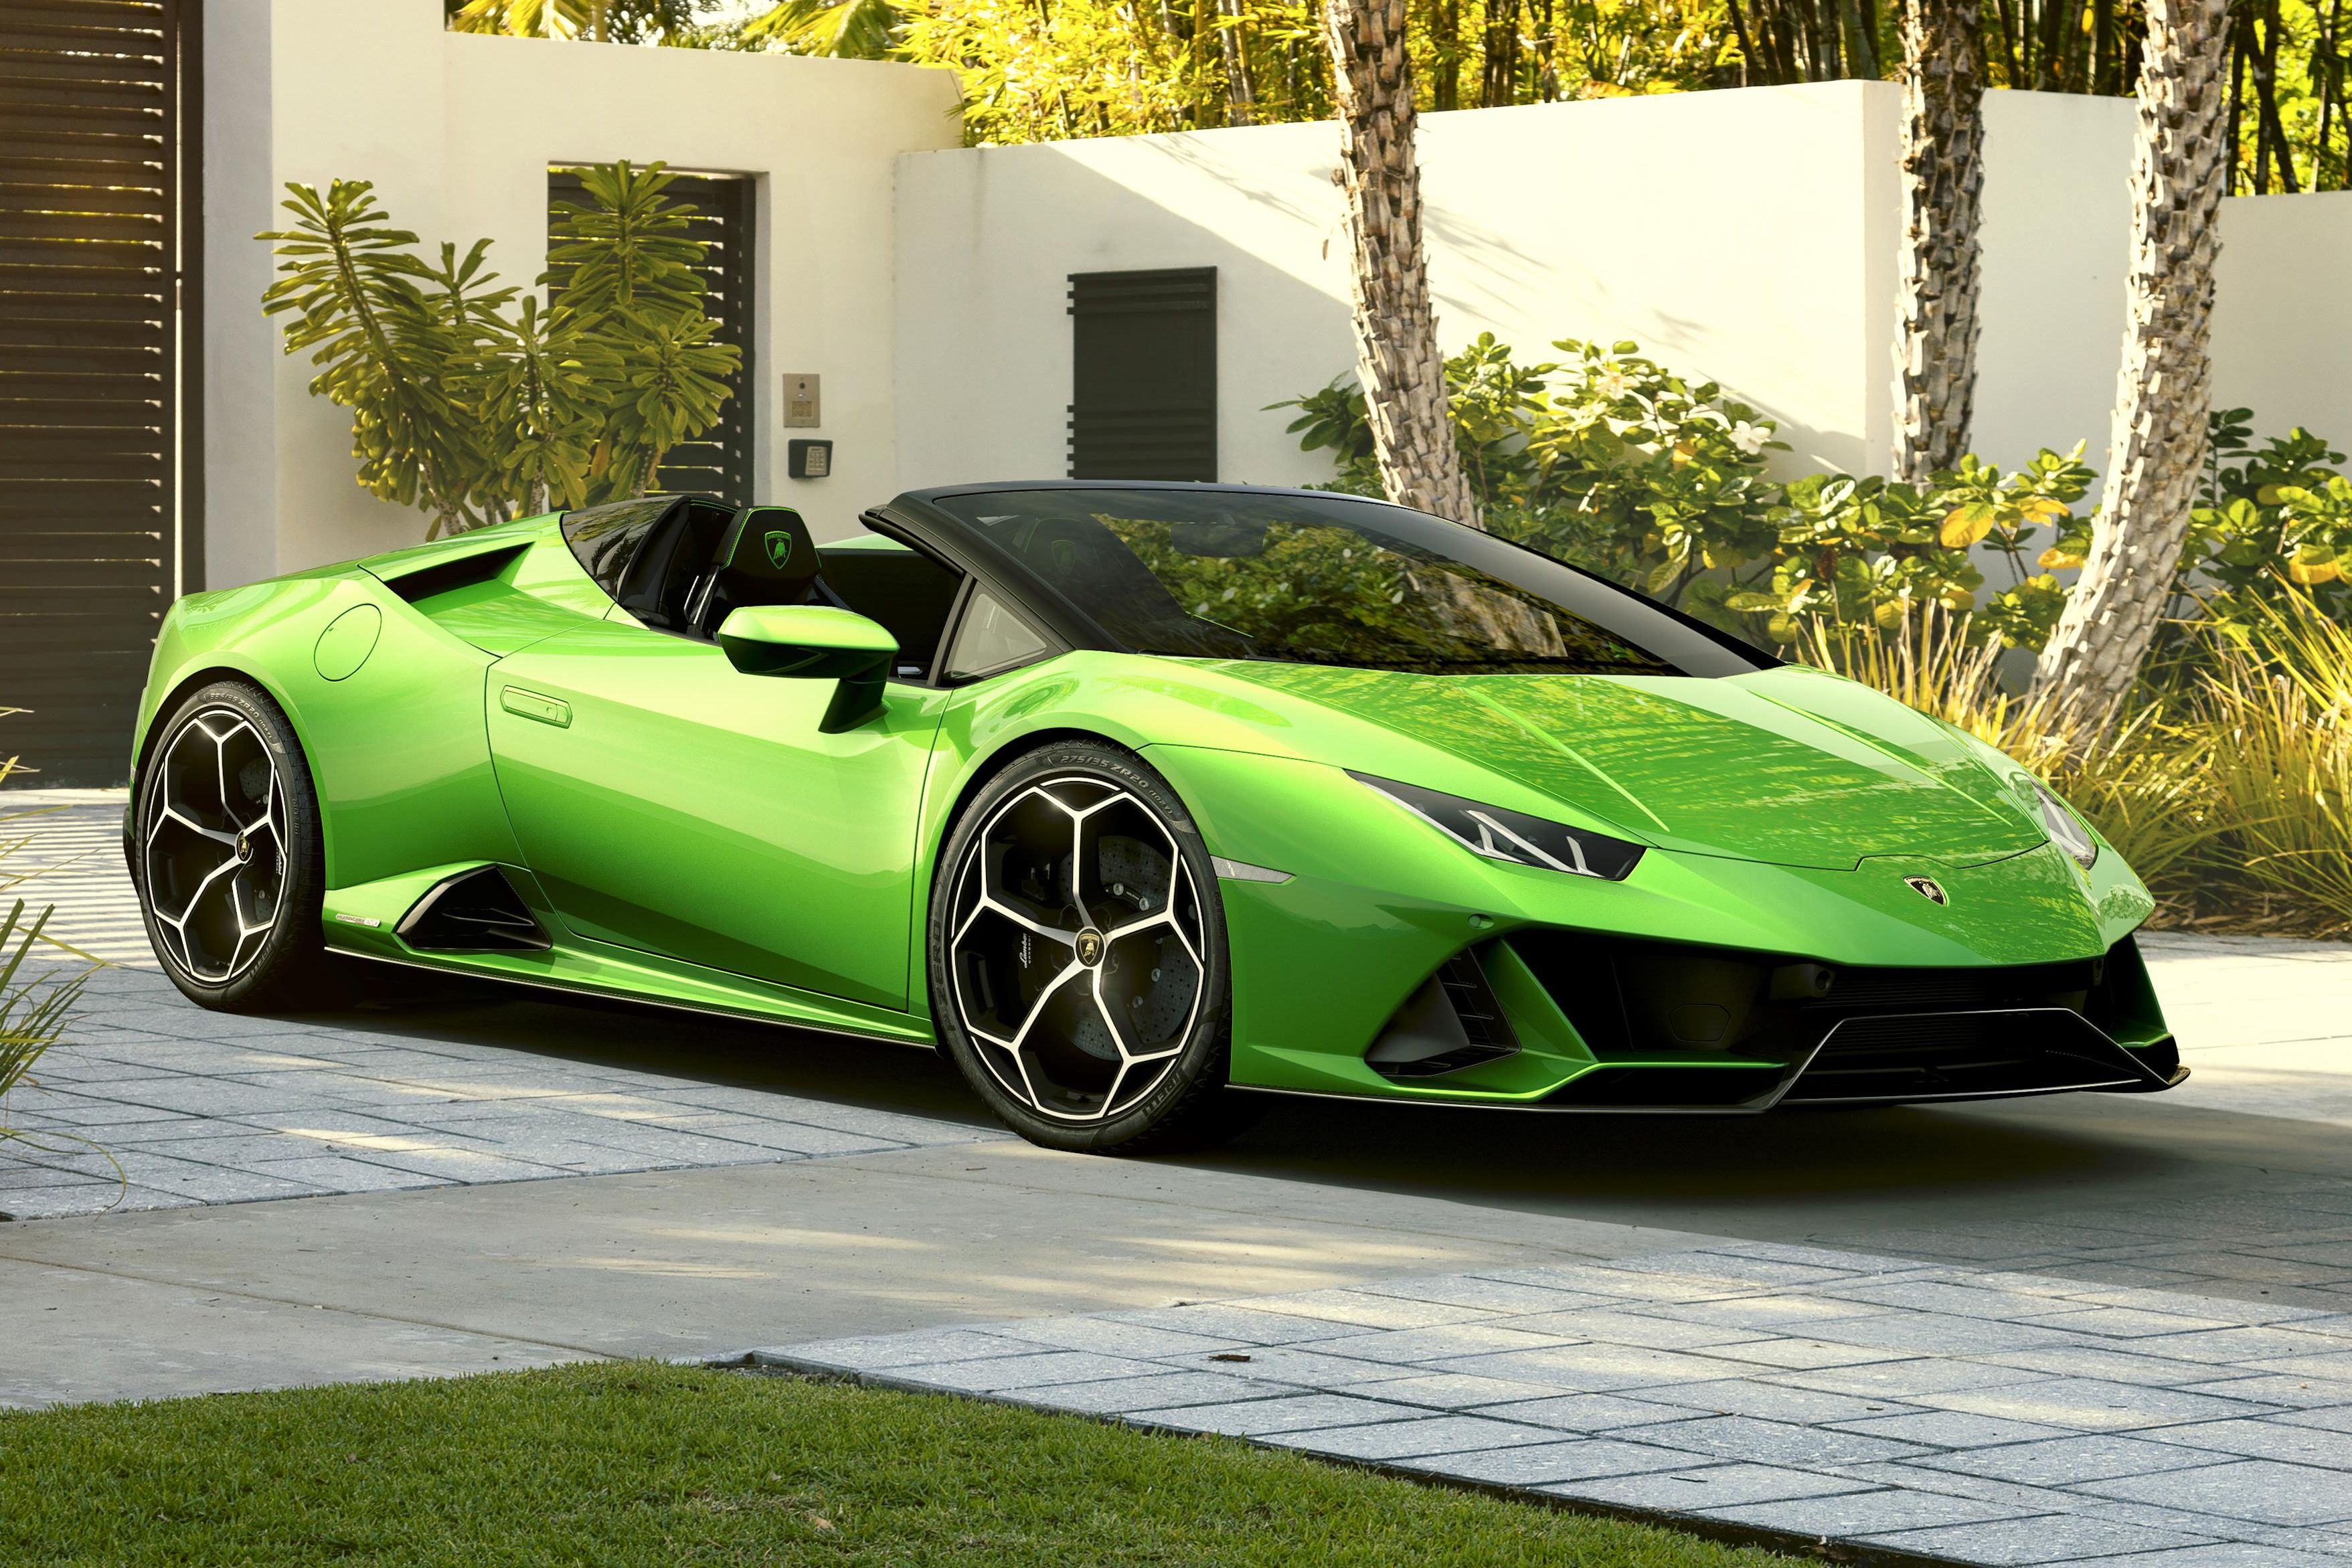 2021 Lamborghini Huracan Review Pricing And Specs